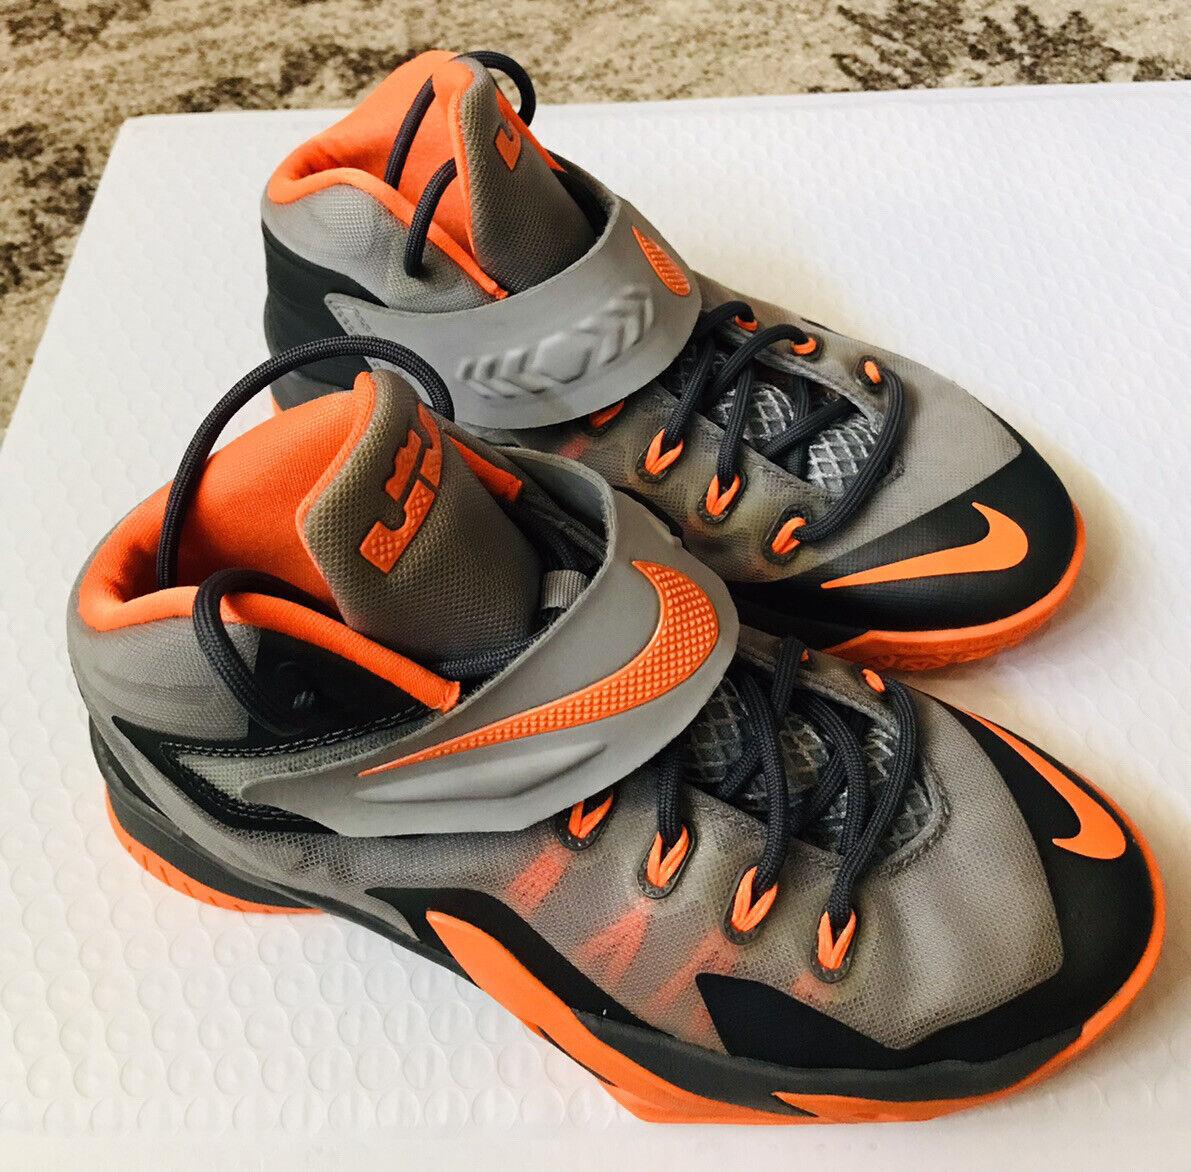 Nike LeBron James Boys Basketball Shoes 4.5Y Grey And Orange 653645 on eBay thumbnail